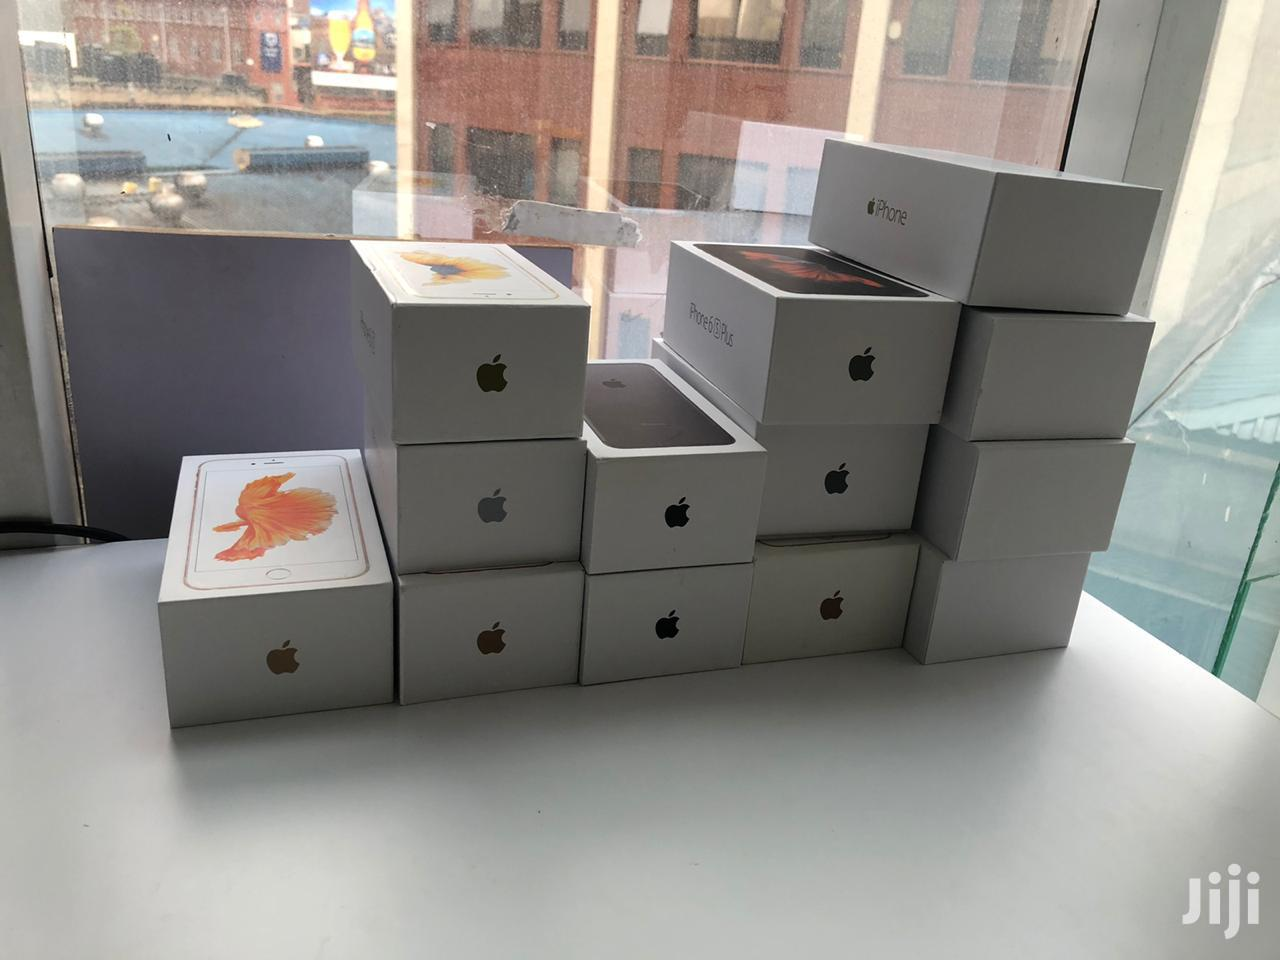 New Apple iPhone 6 16 GB Silver | Mobile Phones for sale in Nairobi Central, Nairobi, Kenya